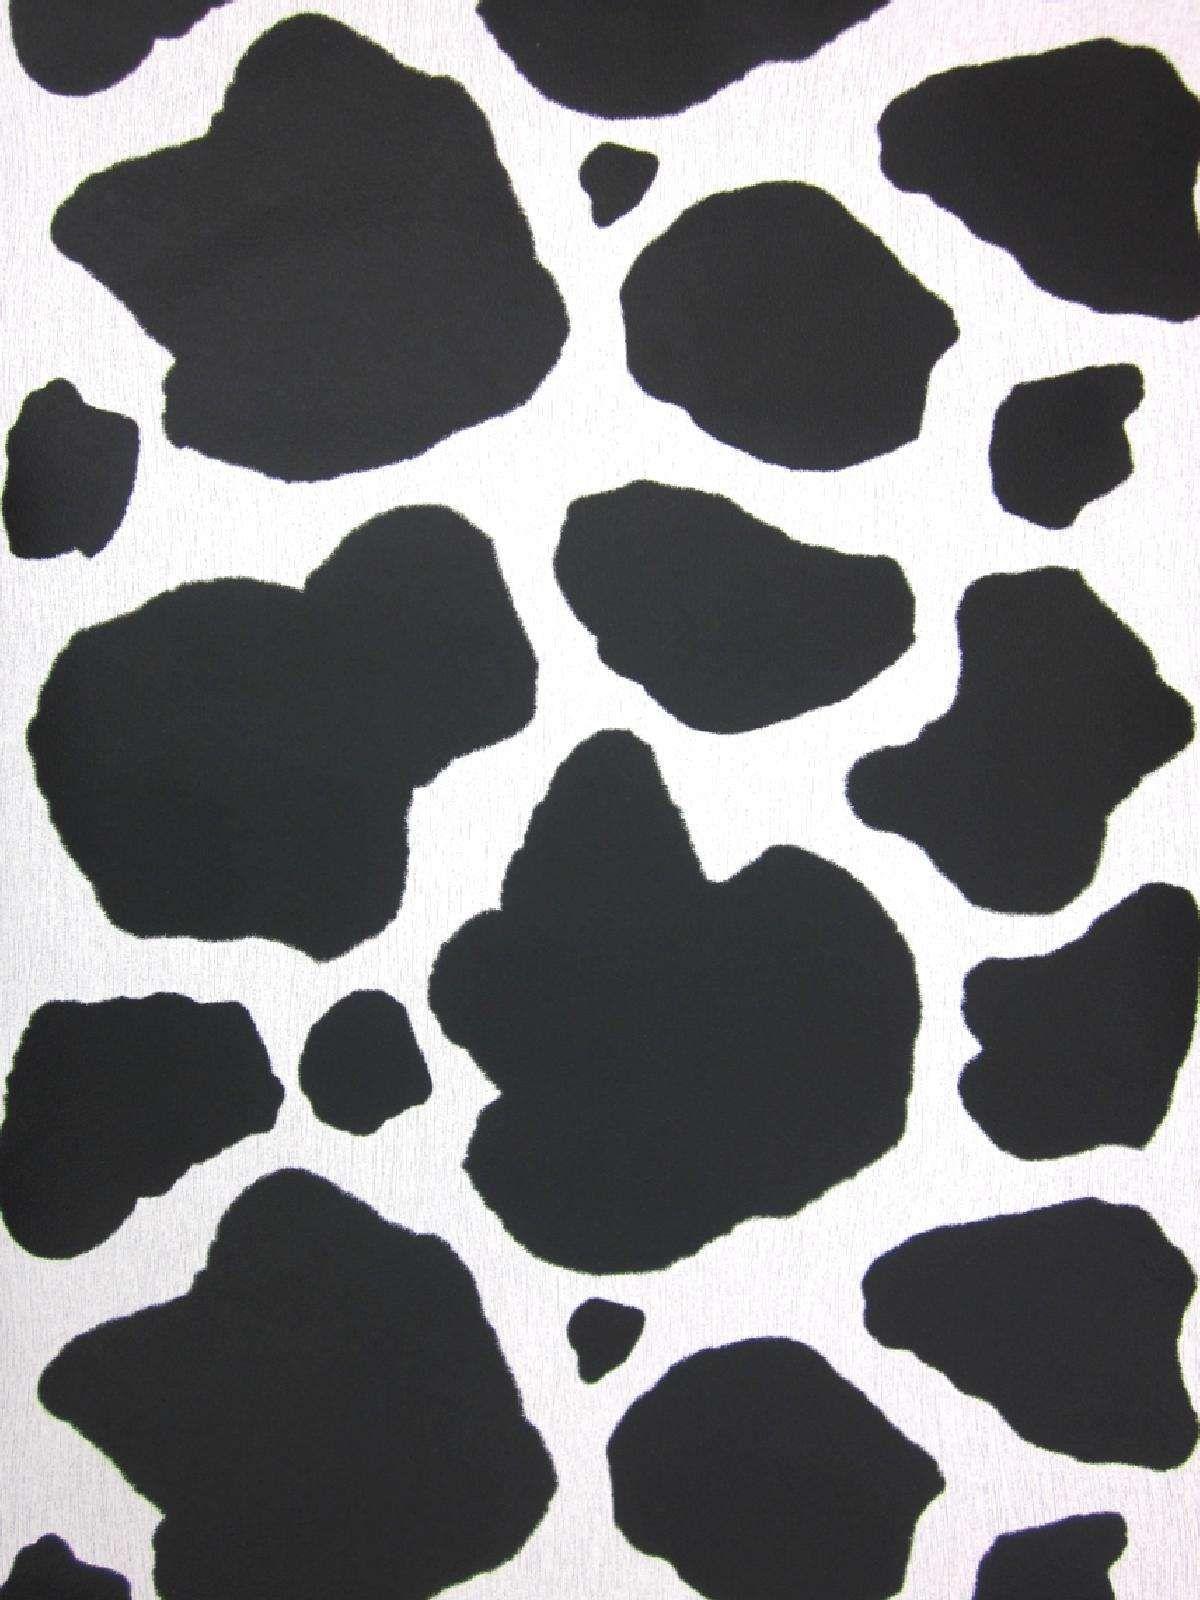 Cow Print Wallpapers Group Deco fiesta de 15, Globos, Deco